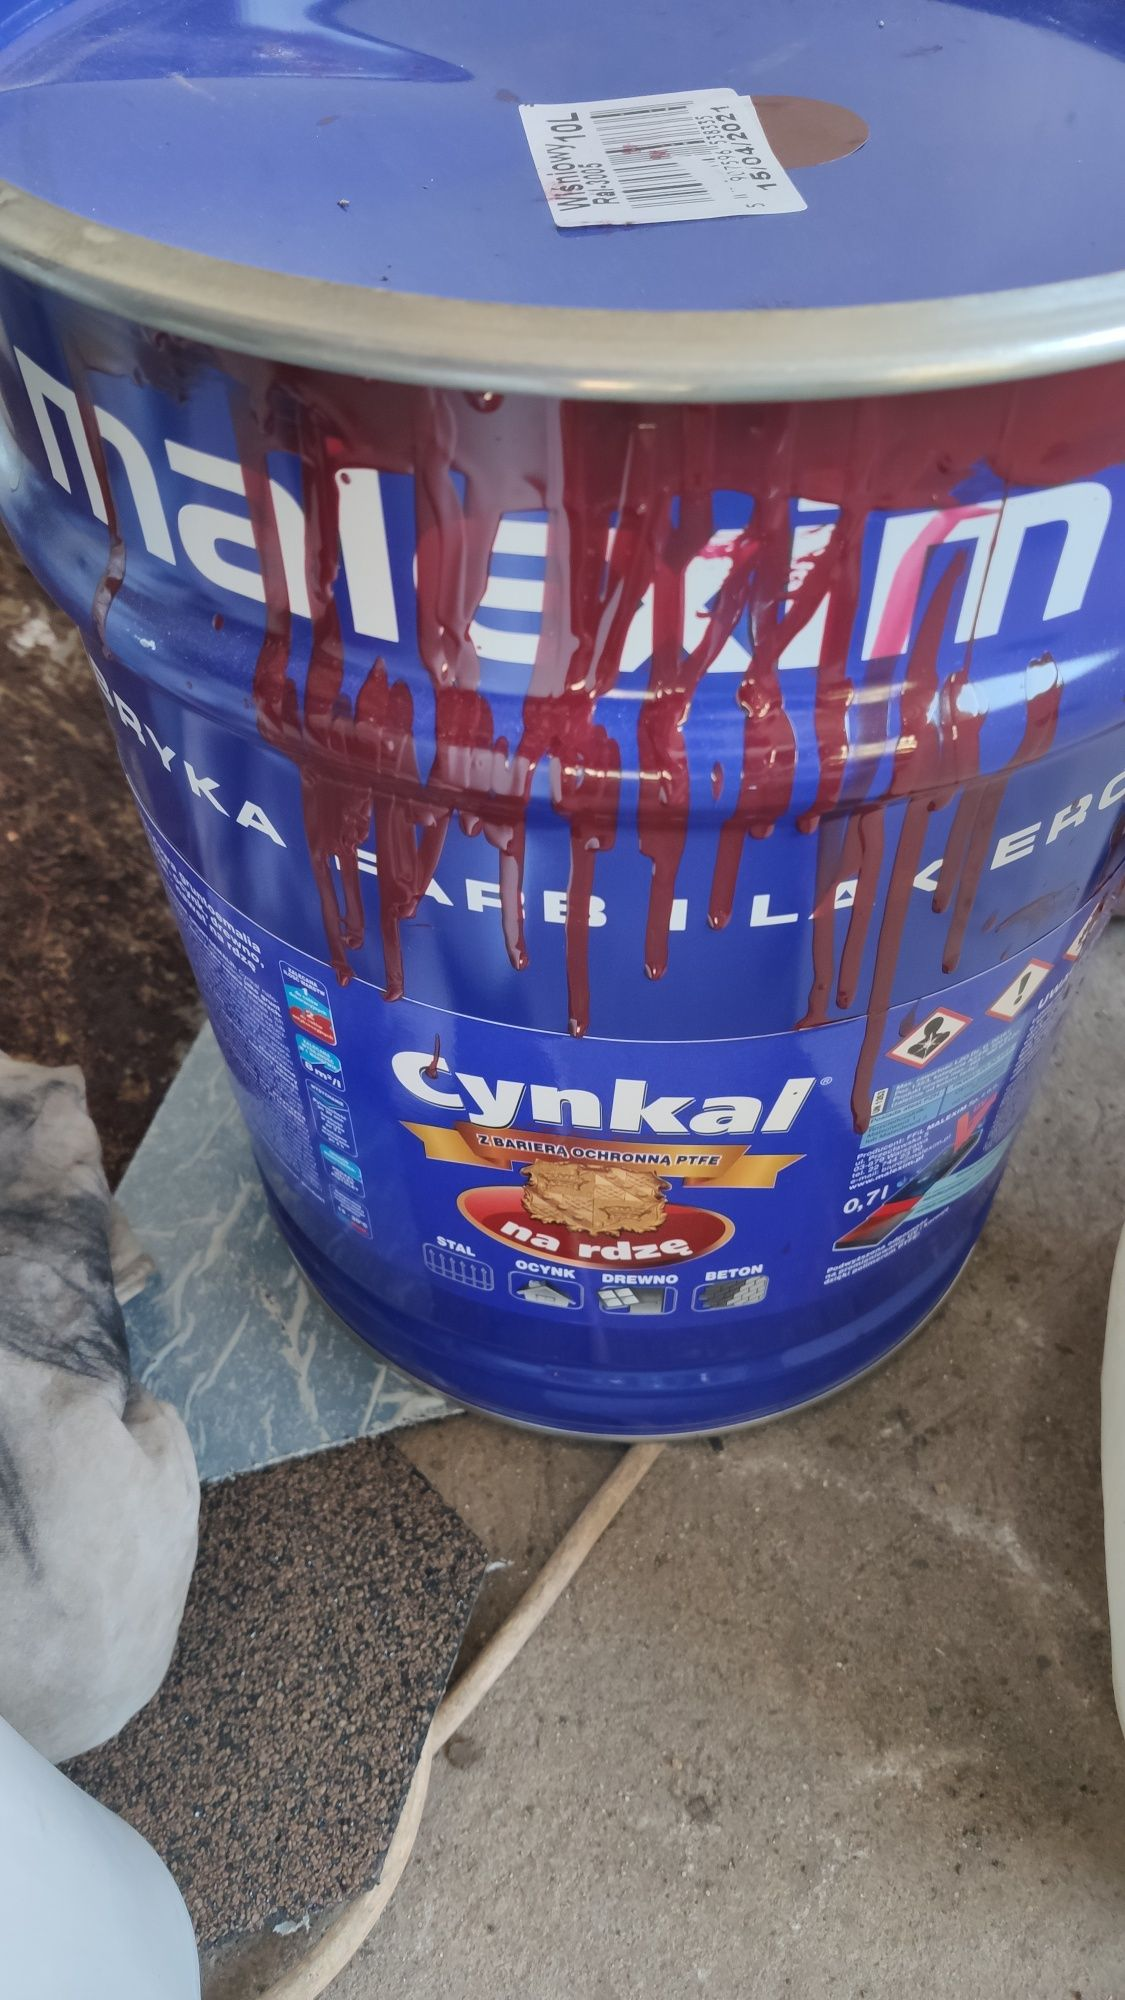 Farba dachowa cynkal ,śliwka RAL 3005